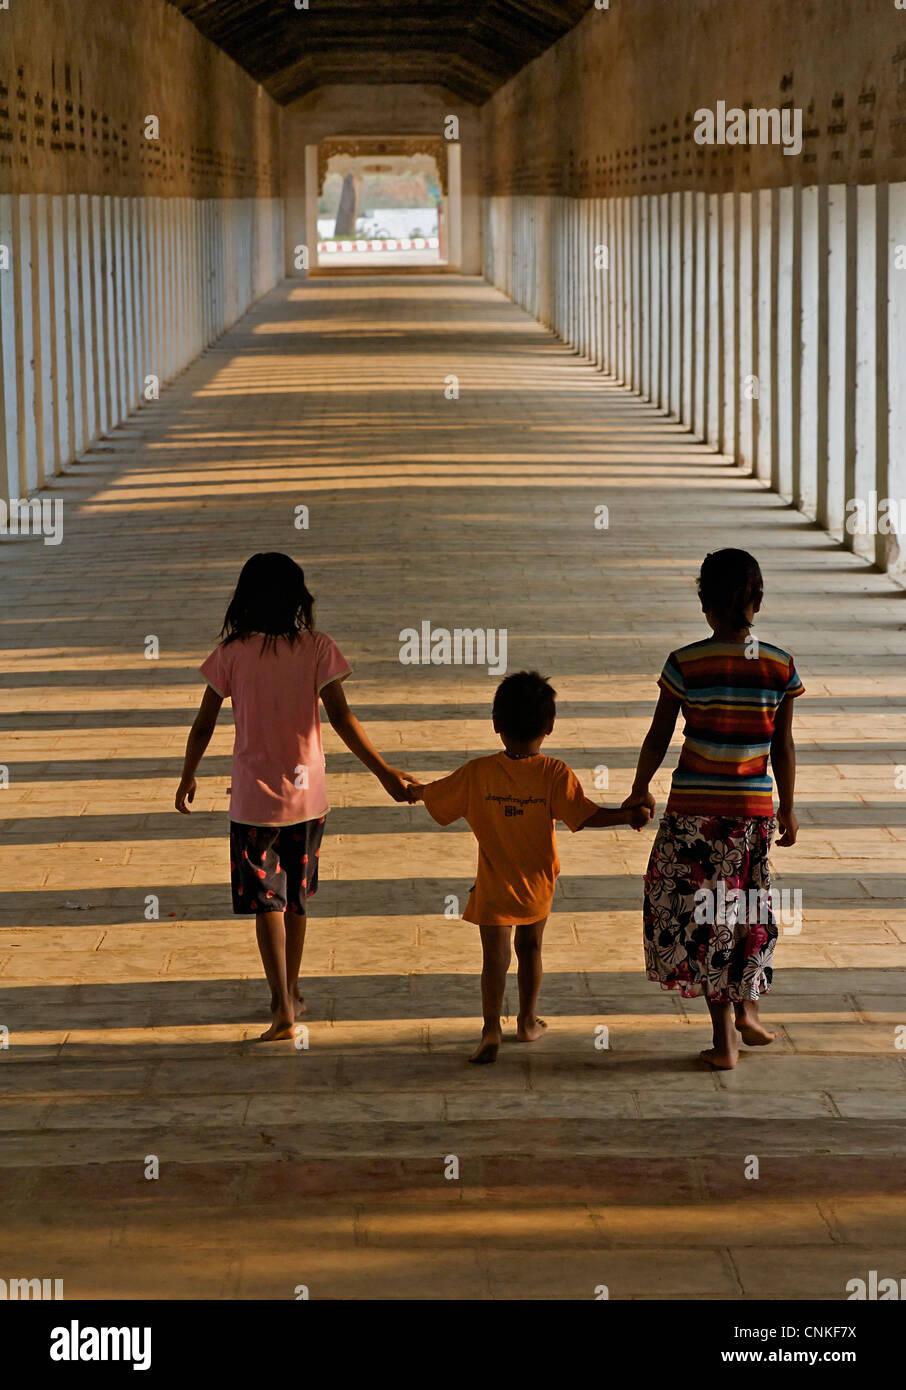 Burmese children walking in the corridor at Shwezigon Pagoda, Bagan. Burma. Myanmar Stock Photo